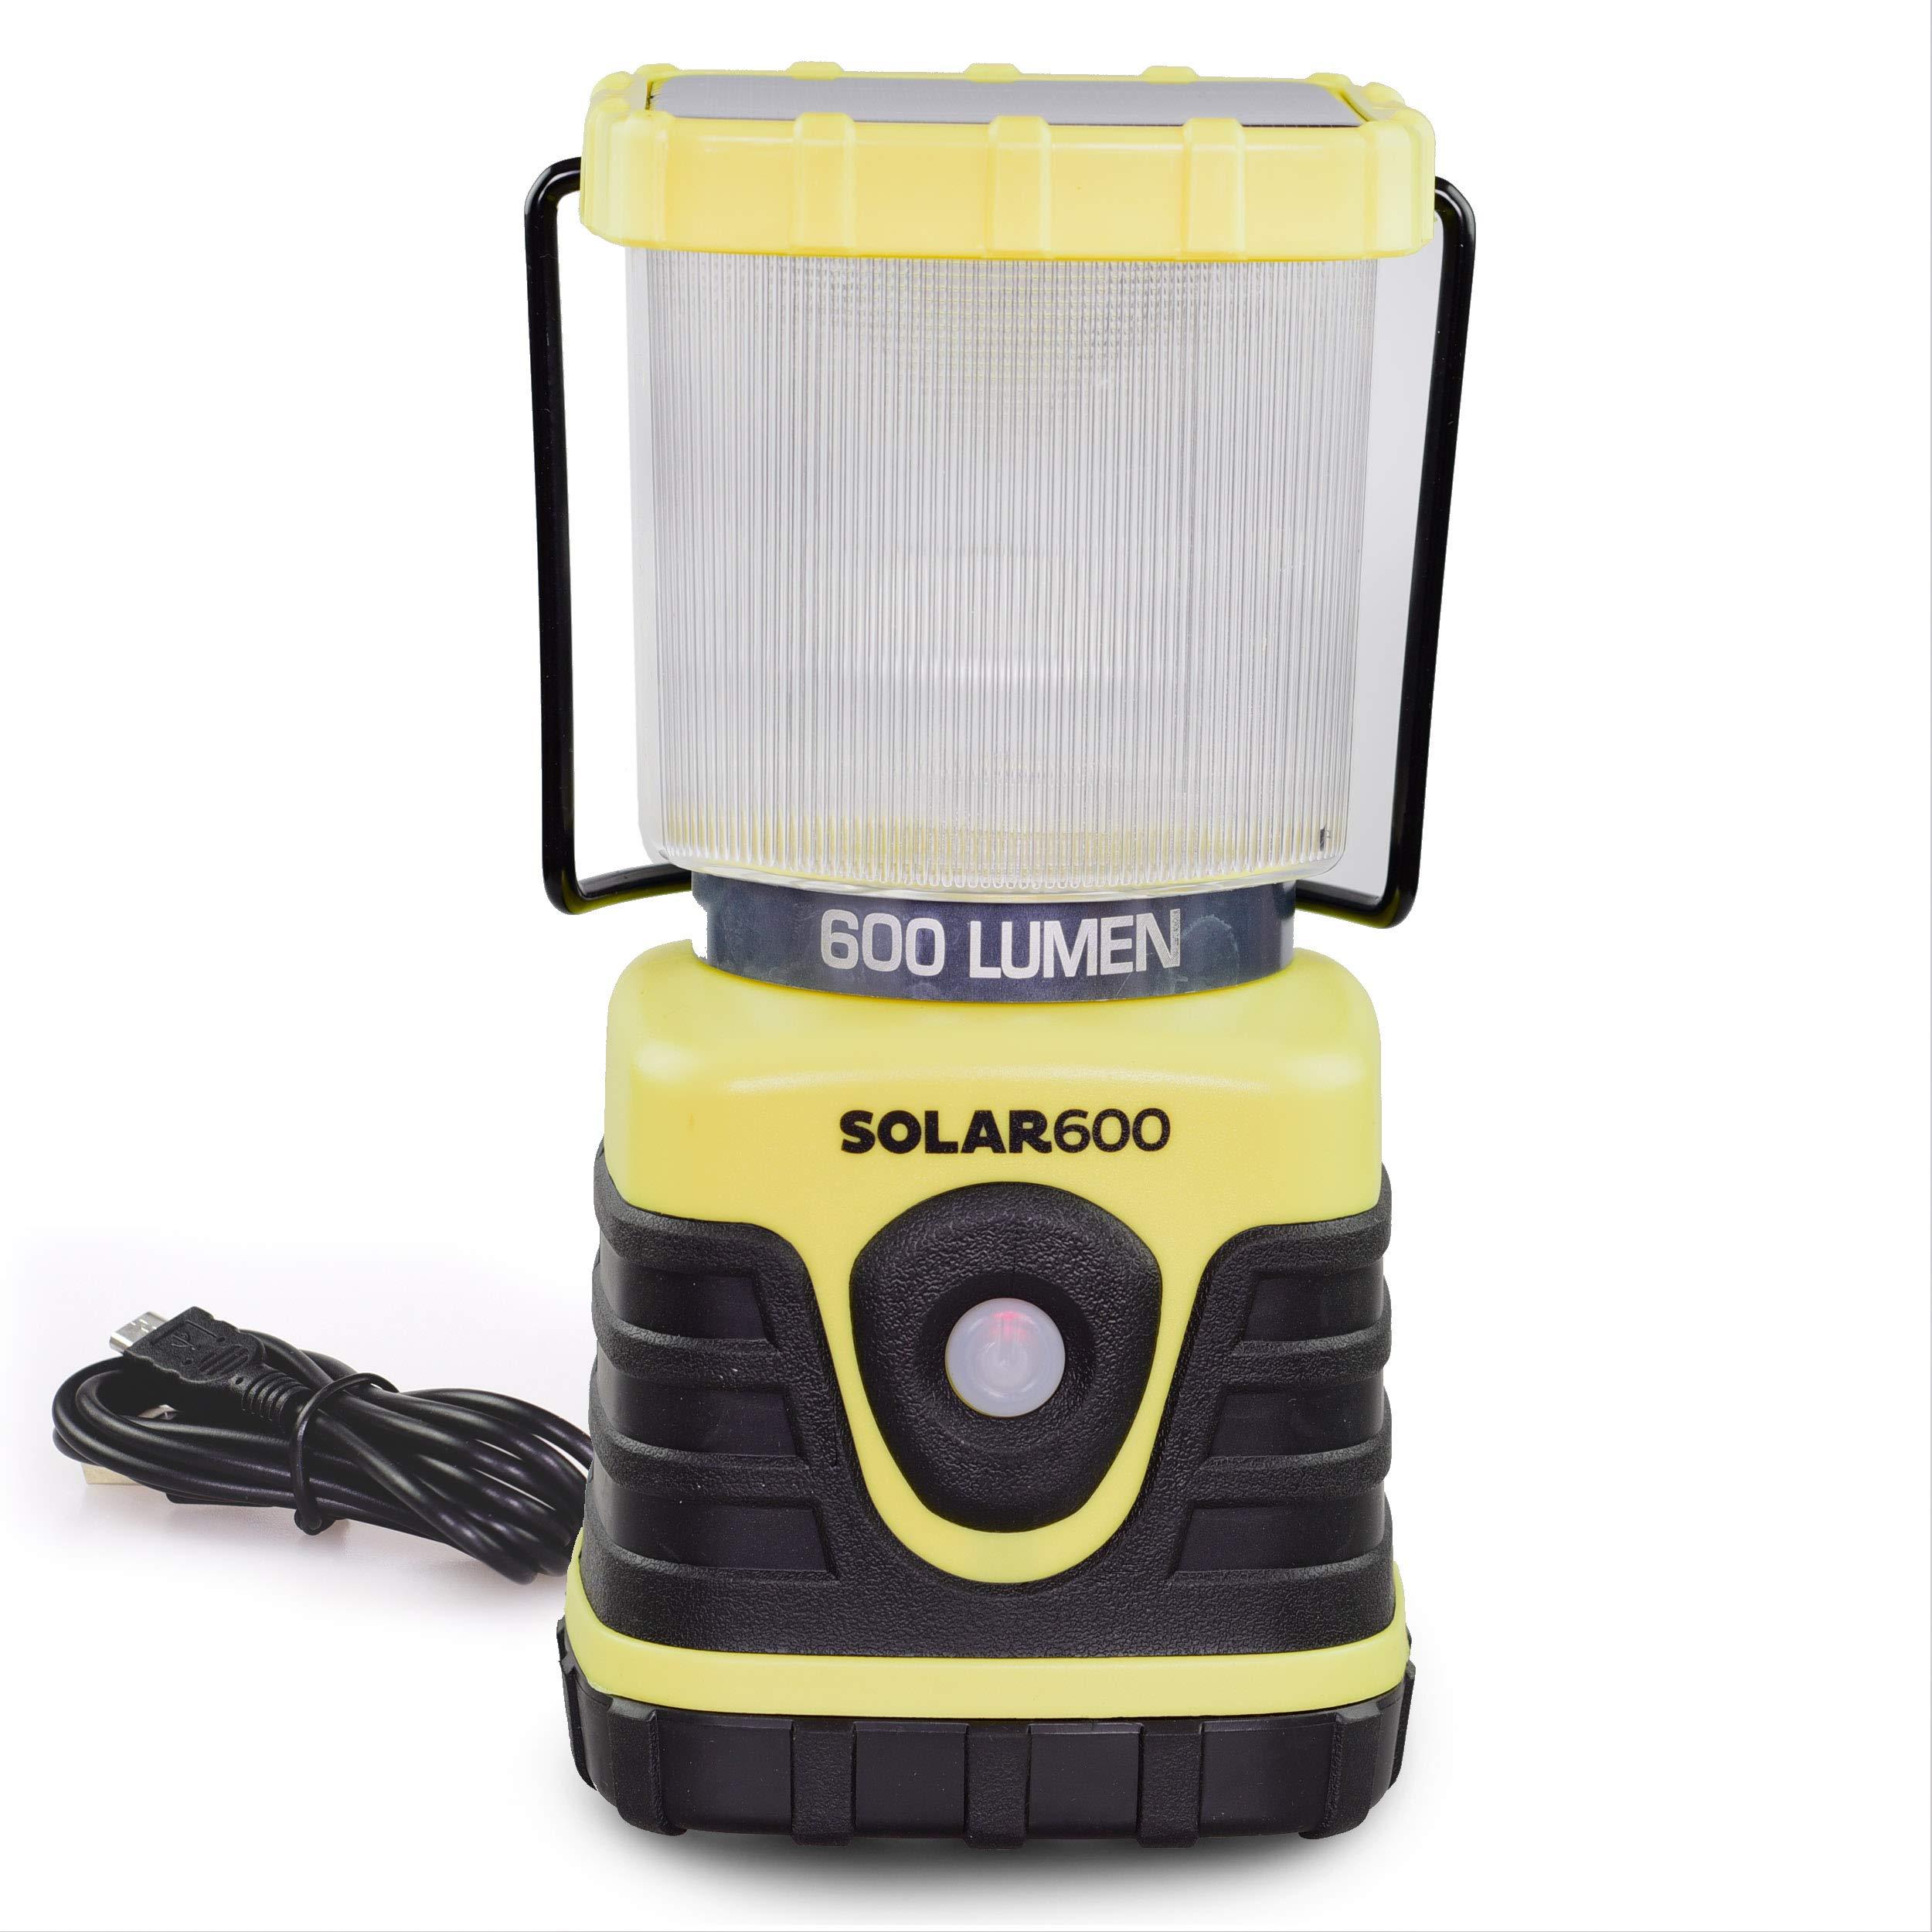 Blazin' Solar Rechargeable Lantern | 600 Lumen Solar Emergency Lantern | Battery Power Bank Phone Charger | Storm, Power Outage Lanterns | Charge Via USB or Sun by Blazin